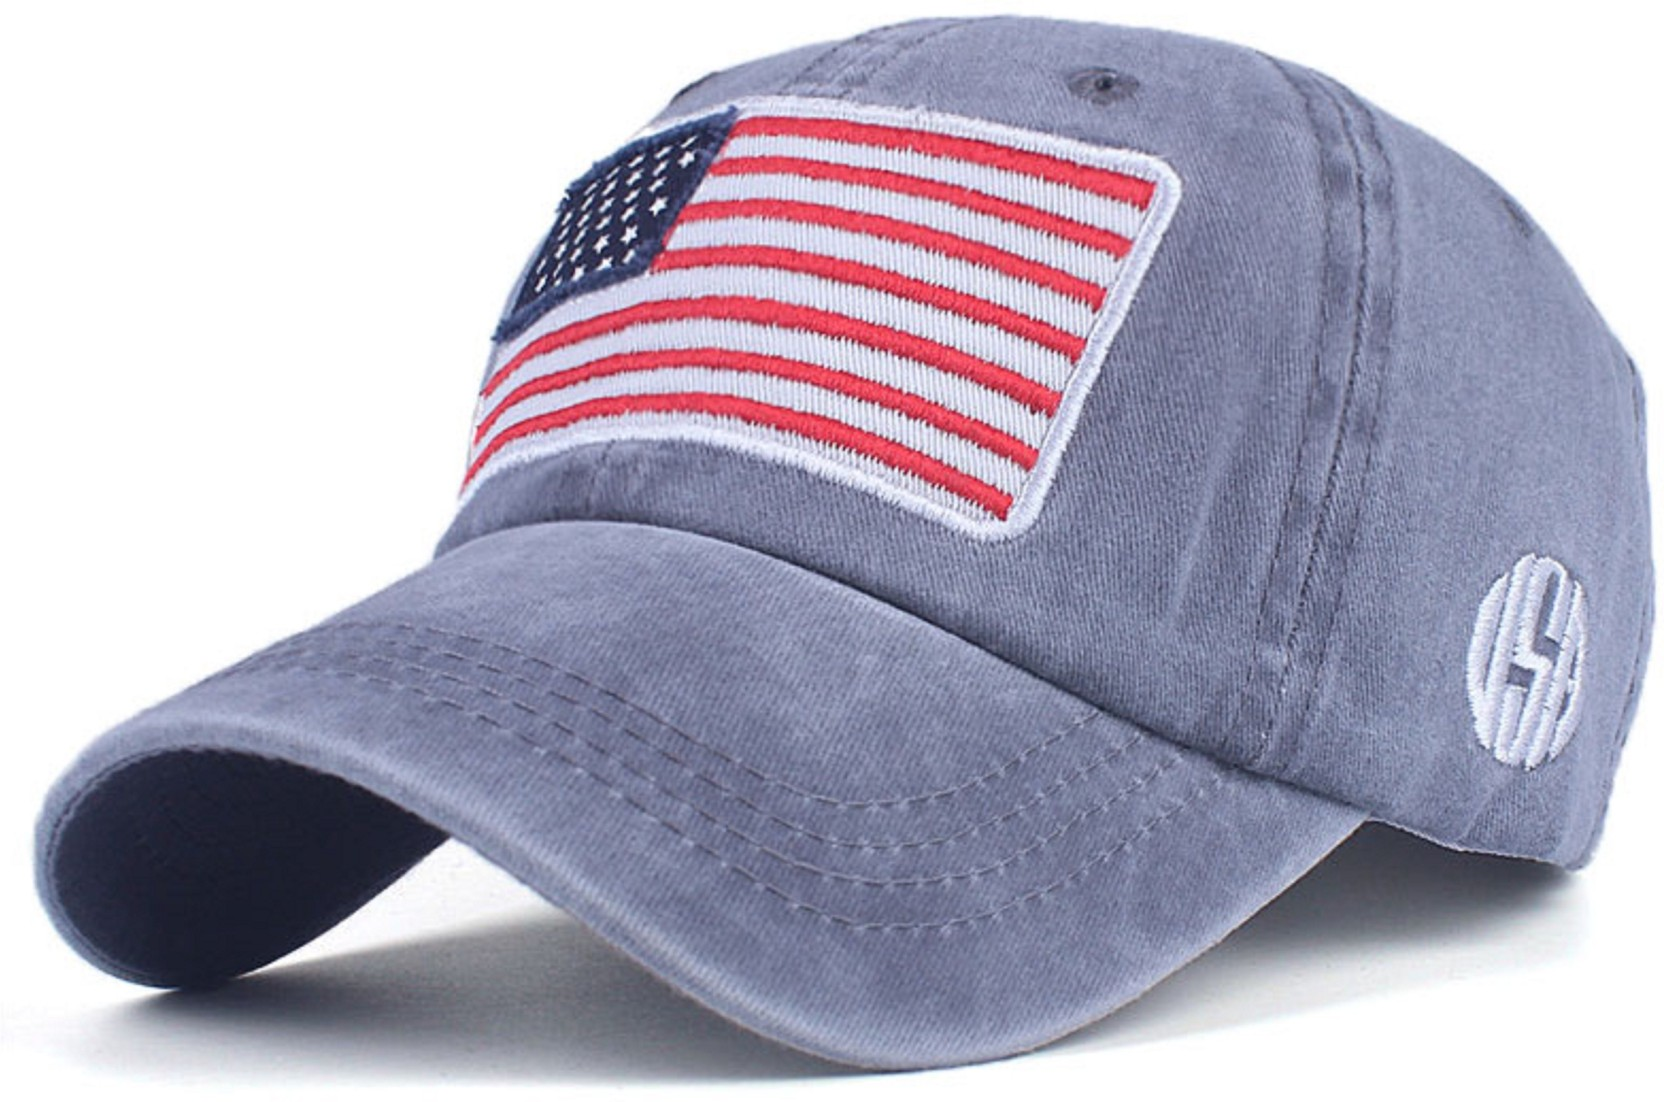 to wear - Caps stylish flipkart video